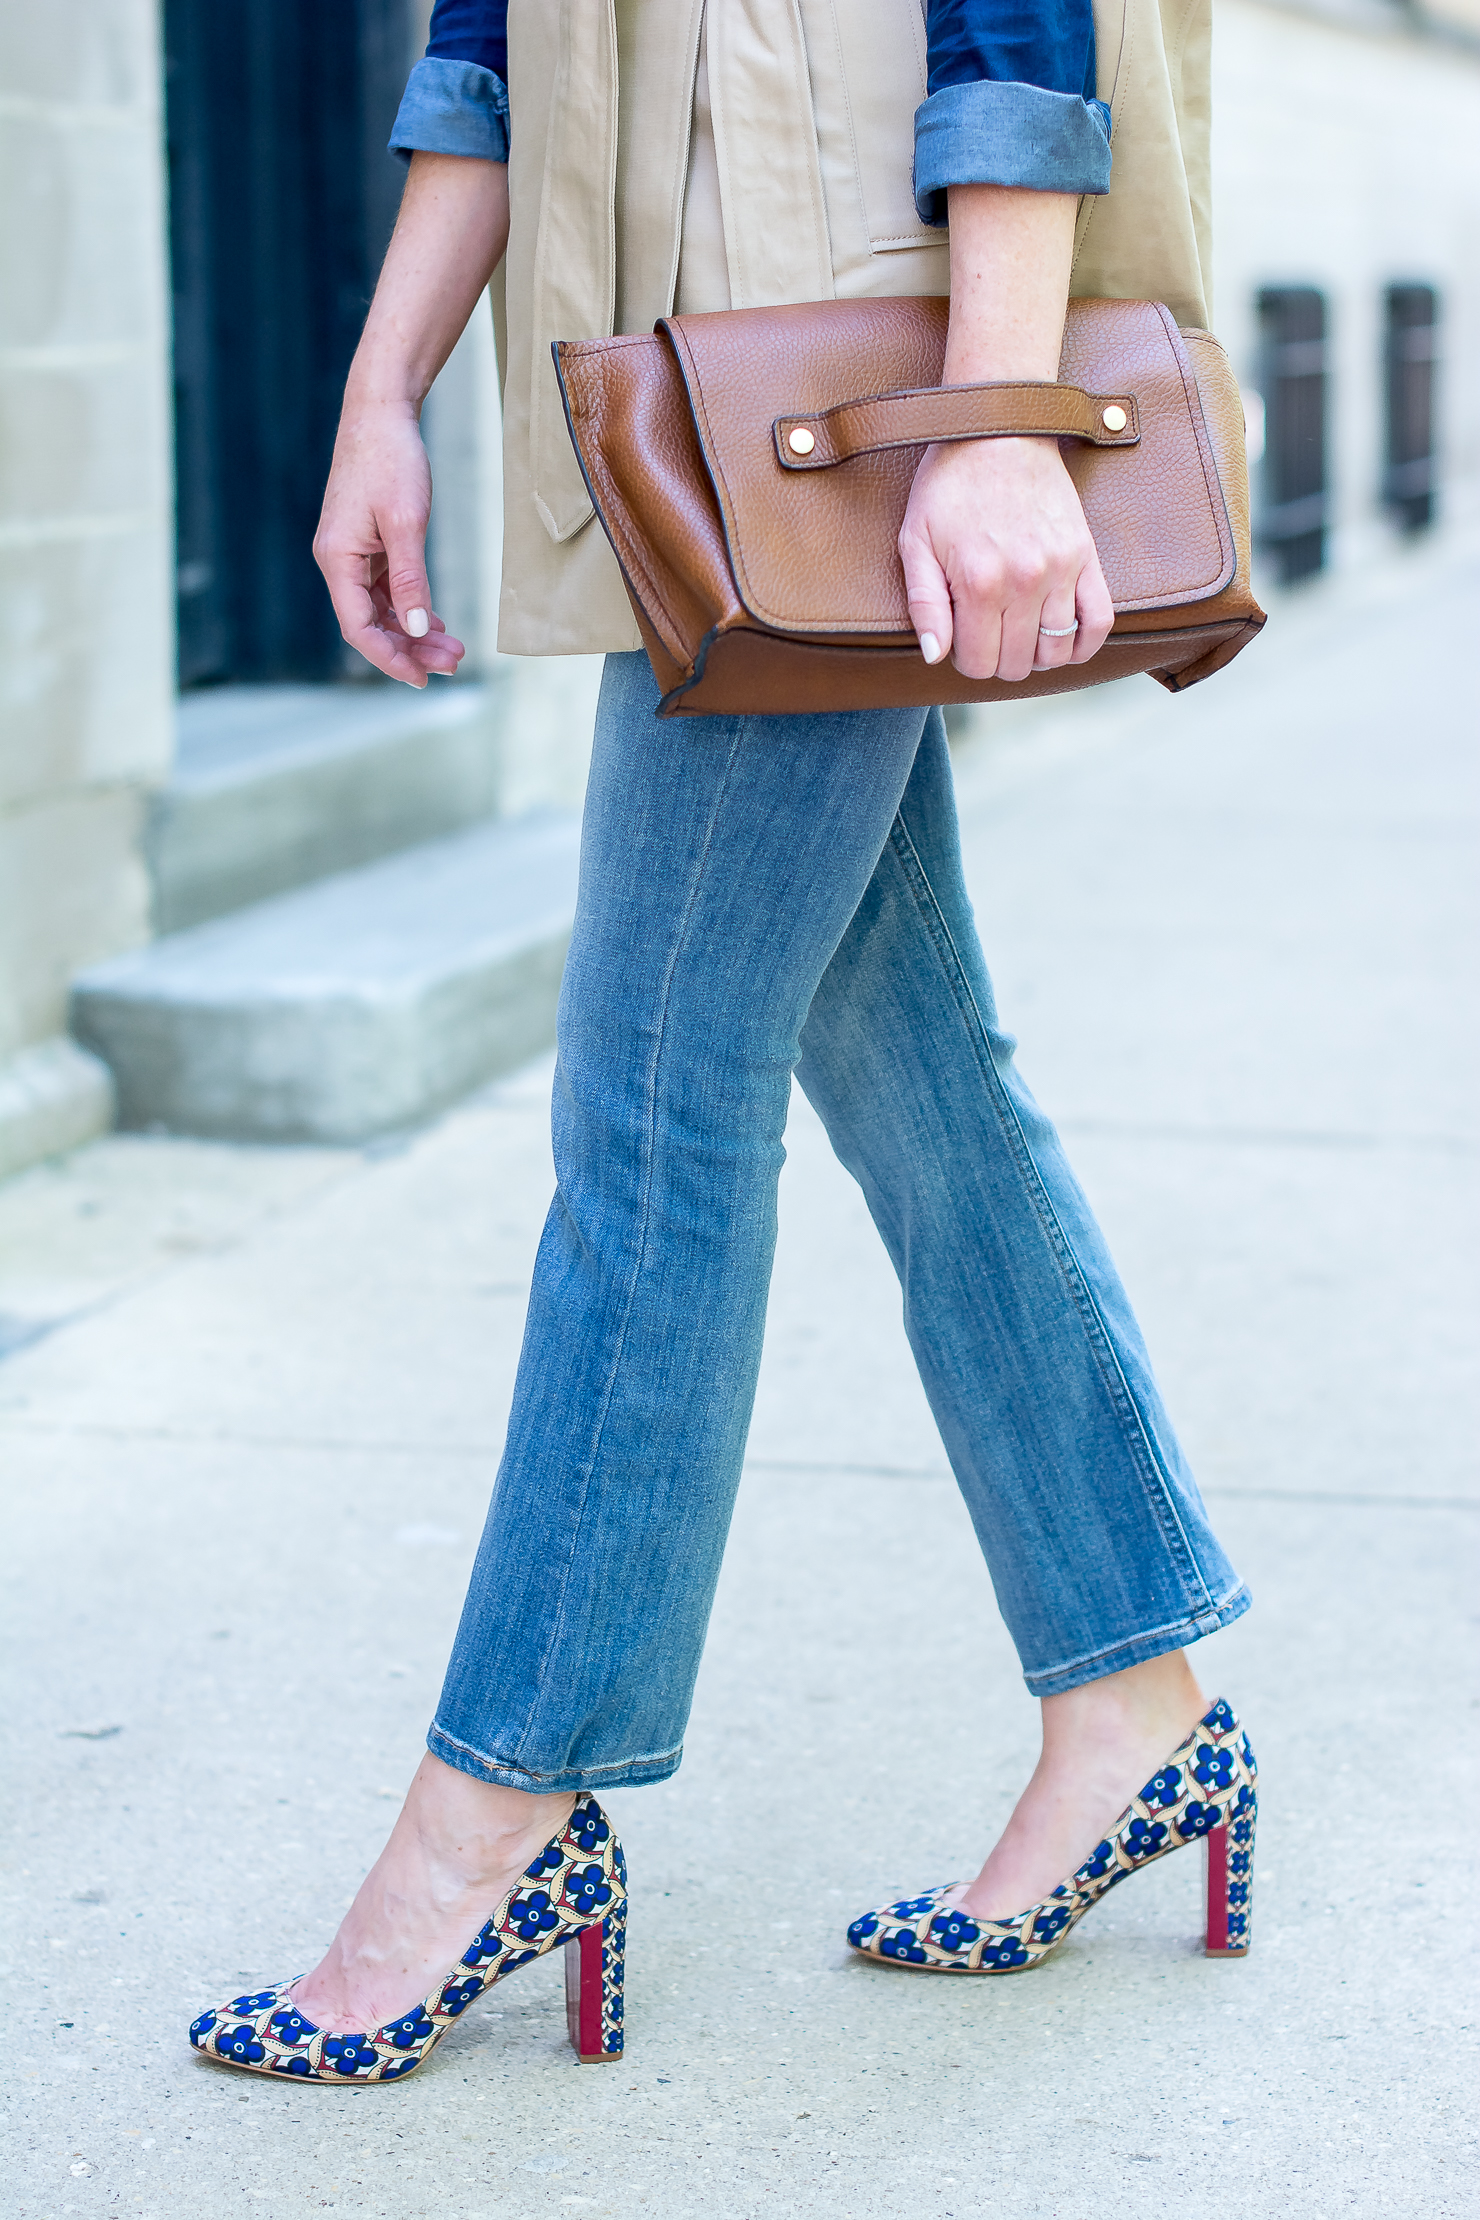 jcrew-cape-trench-dark-blue-chambray-hm-kick-flare-jeans-nine-west-printed-round-toe-pumps-zara-clutch-6